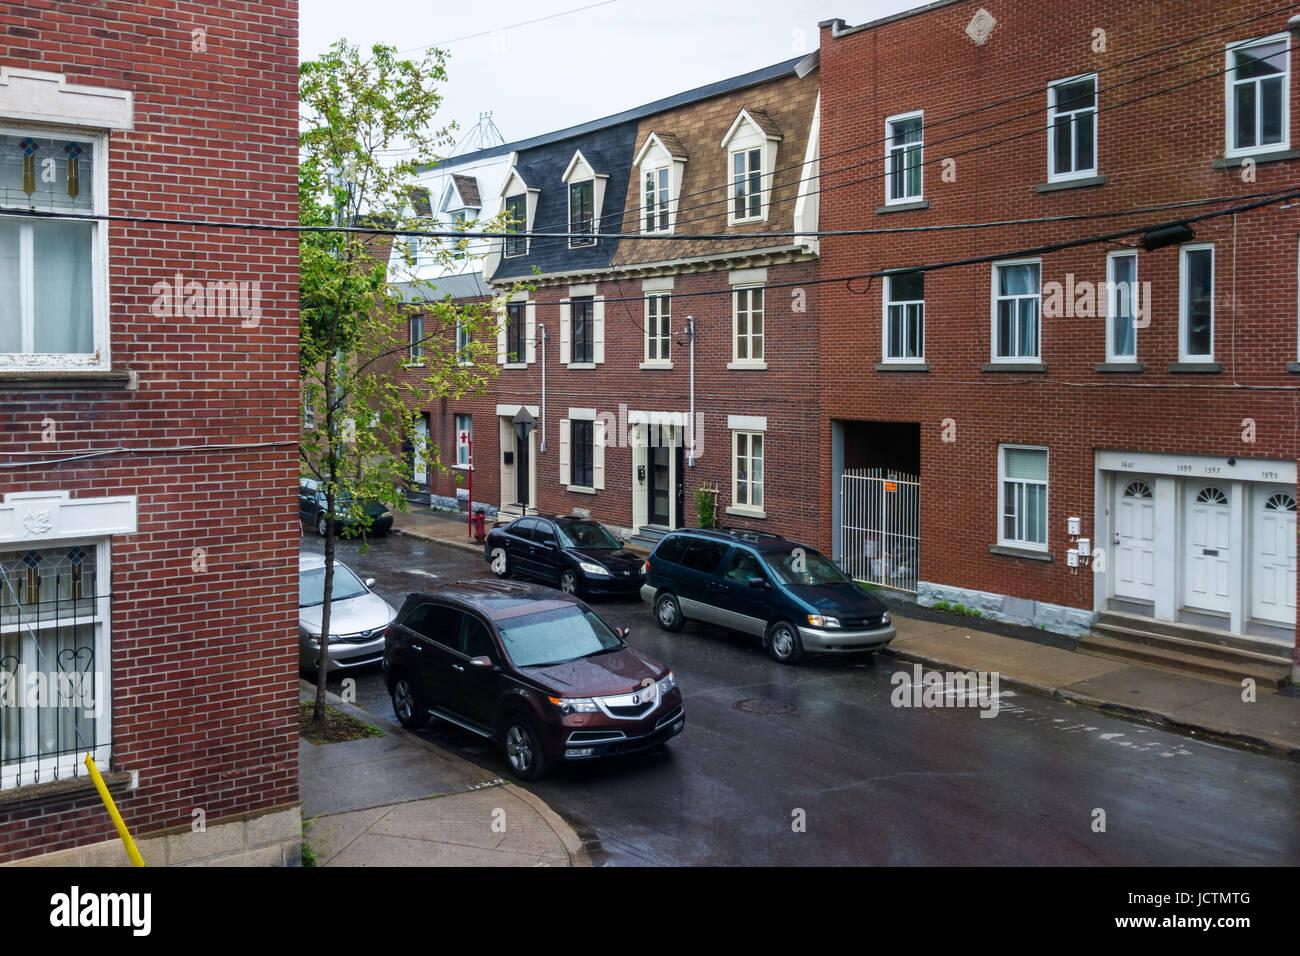 Montreal, Canada - May 25, 2017: Residential brick buildings in Quebec region in Sainte Marie neighborhood of city Stock Photo